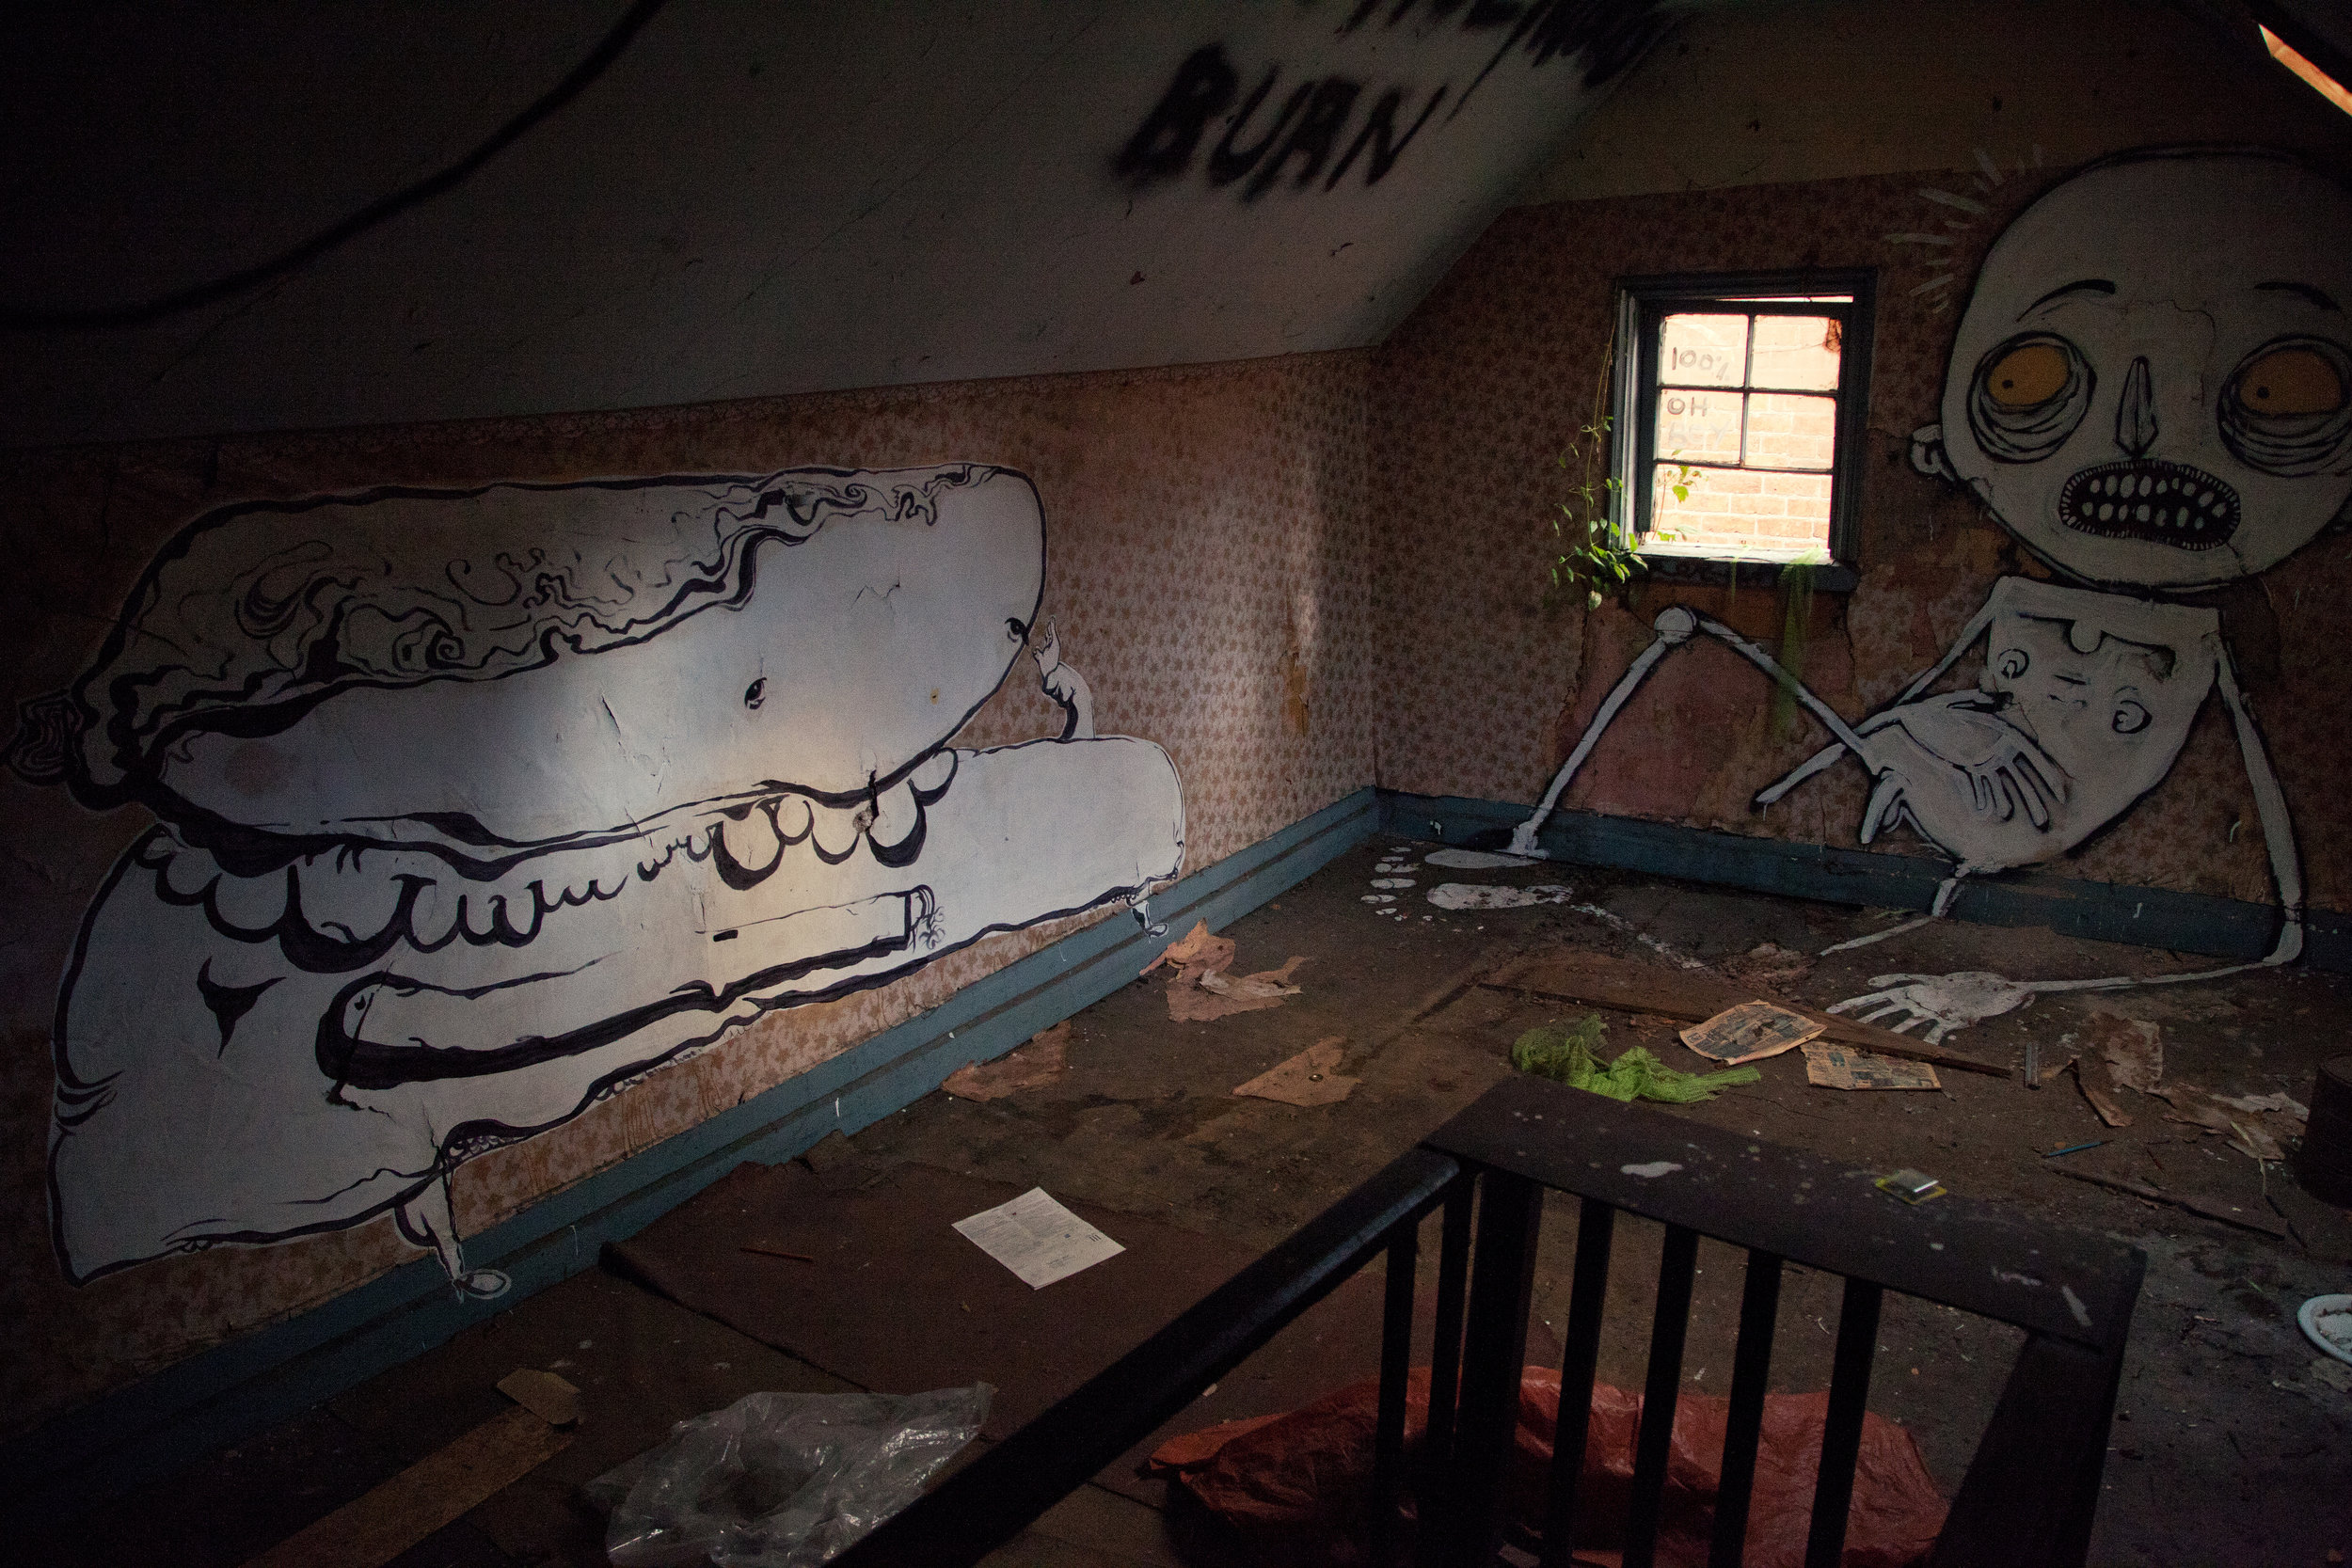 2012-05-27 - Hobart - Goulburn Abandoned House - D3100 - Goulburn 4.jpg